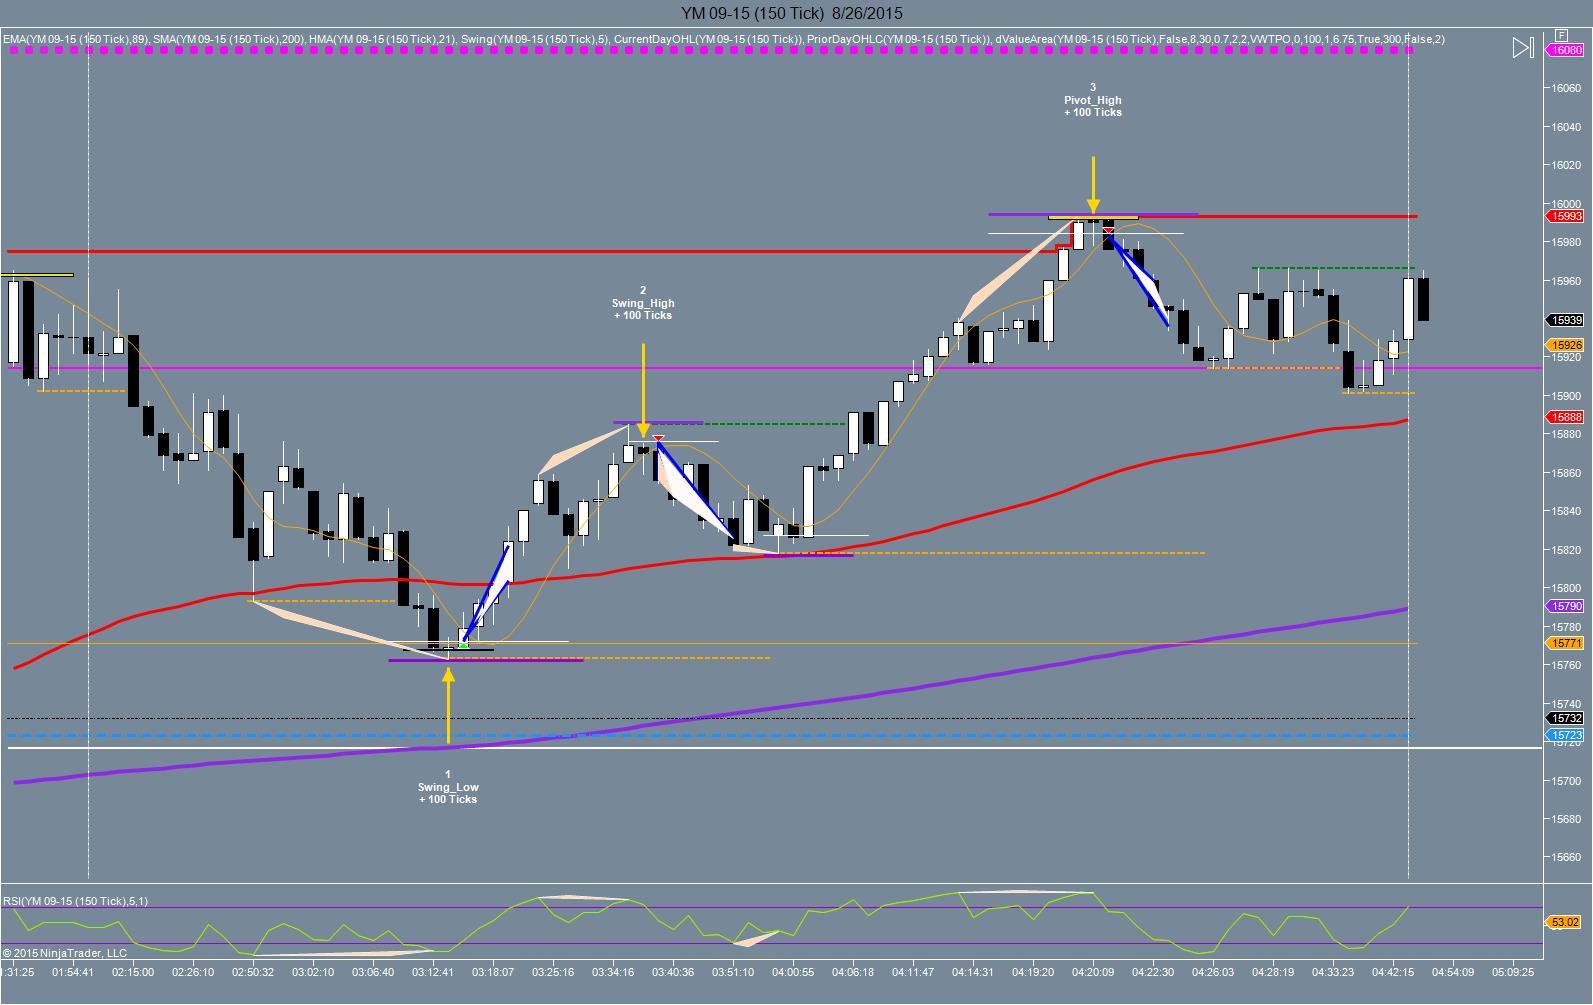 Ym trading strategies